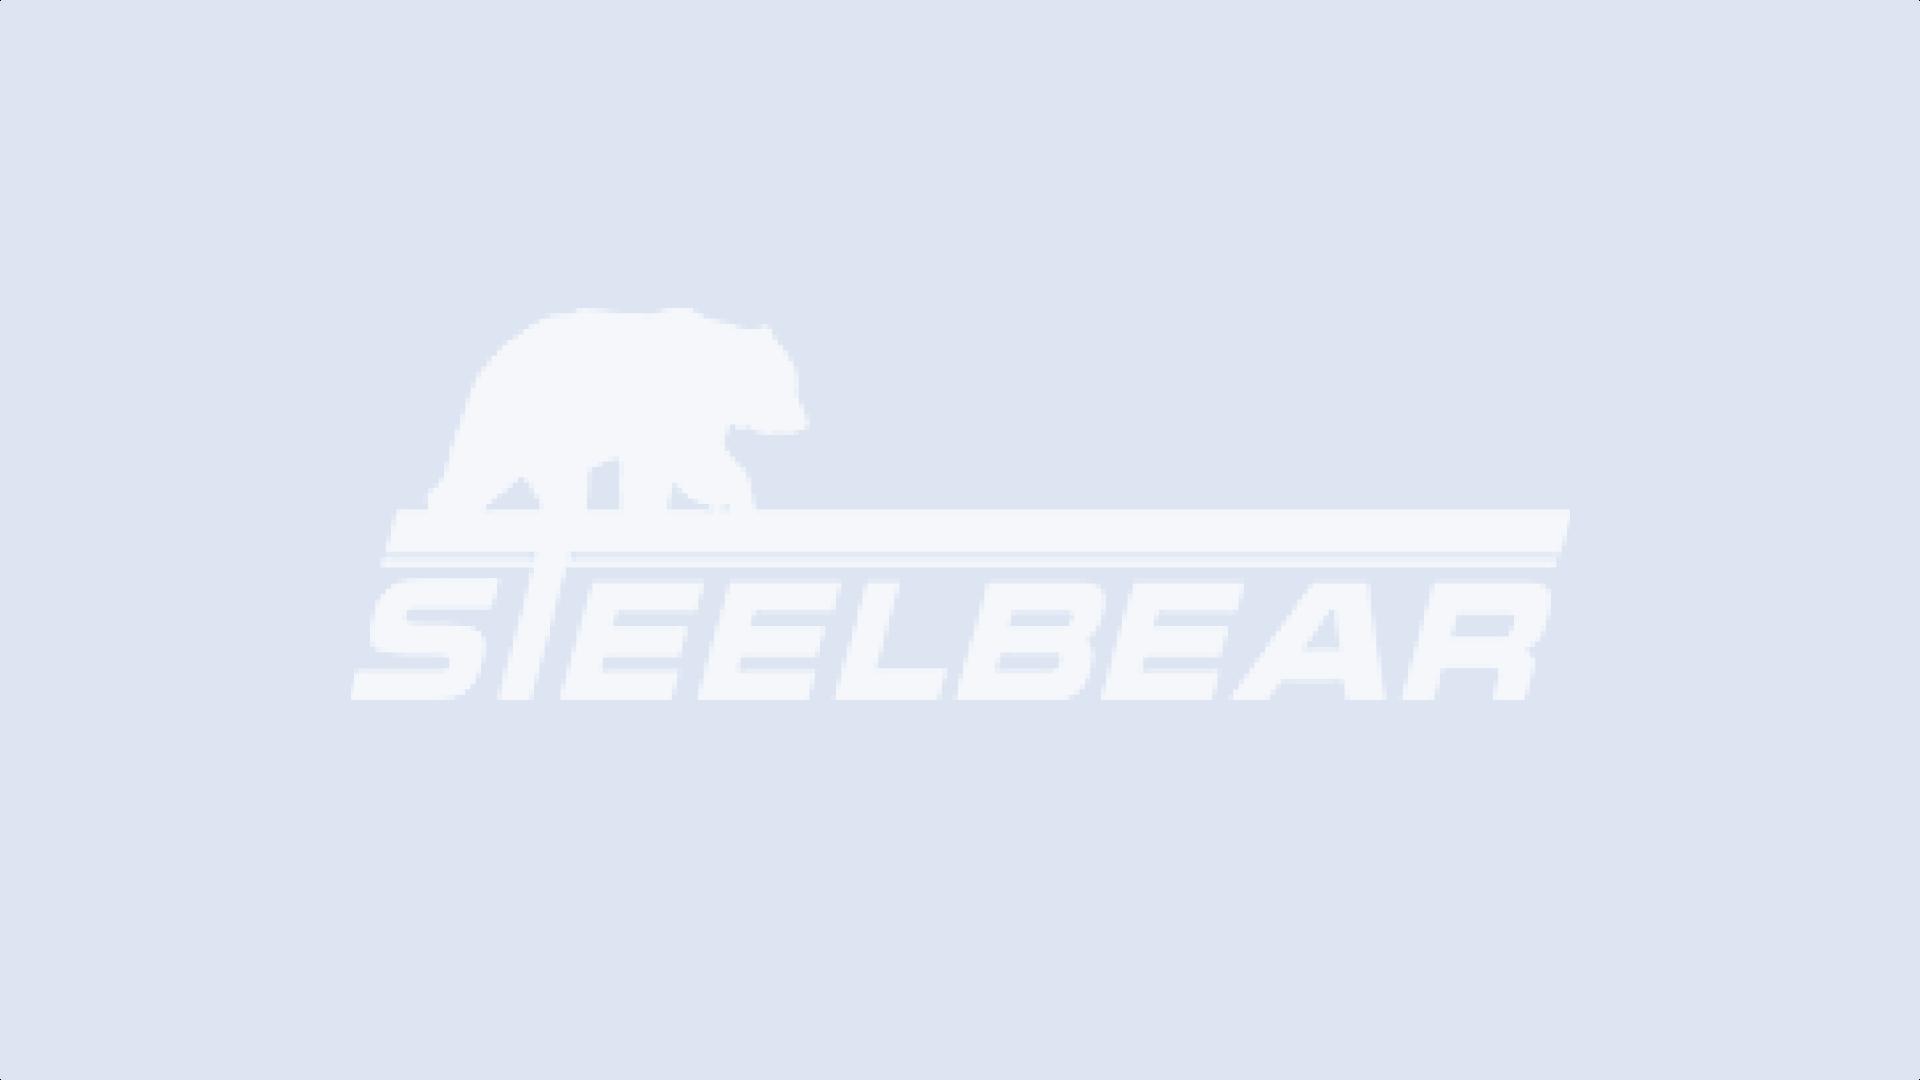 STEELBEAR продолжает дарить подарки